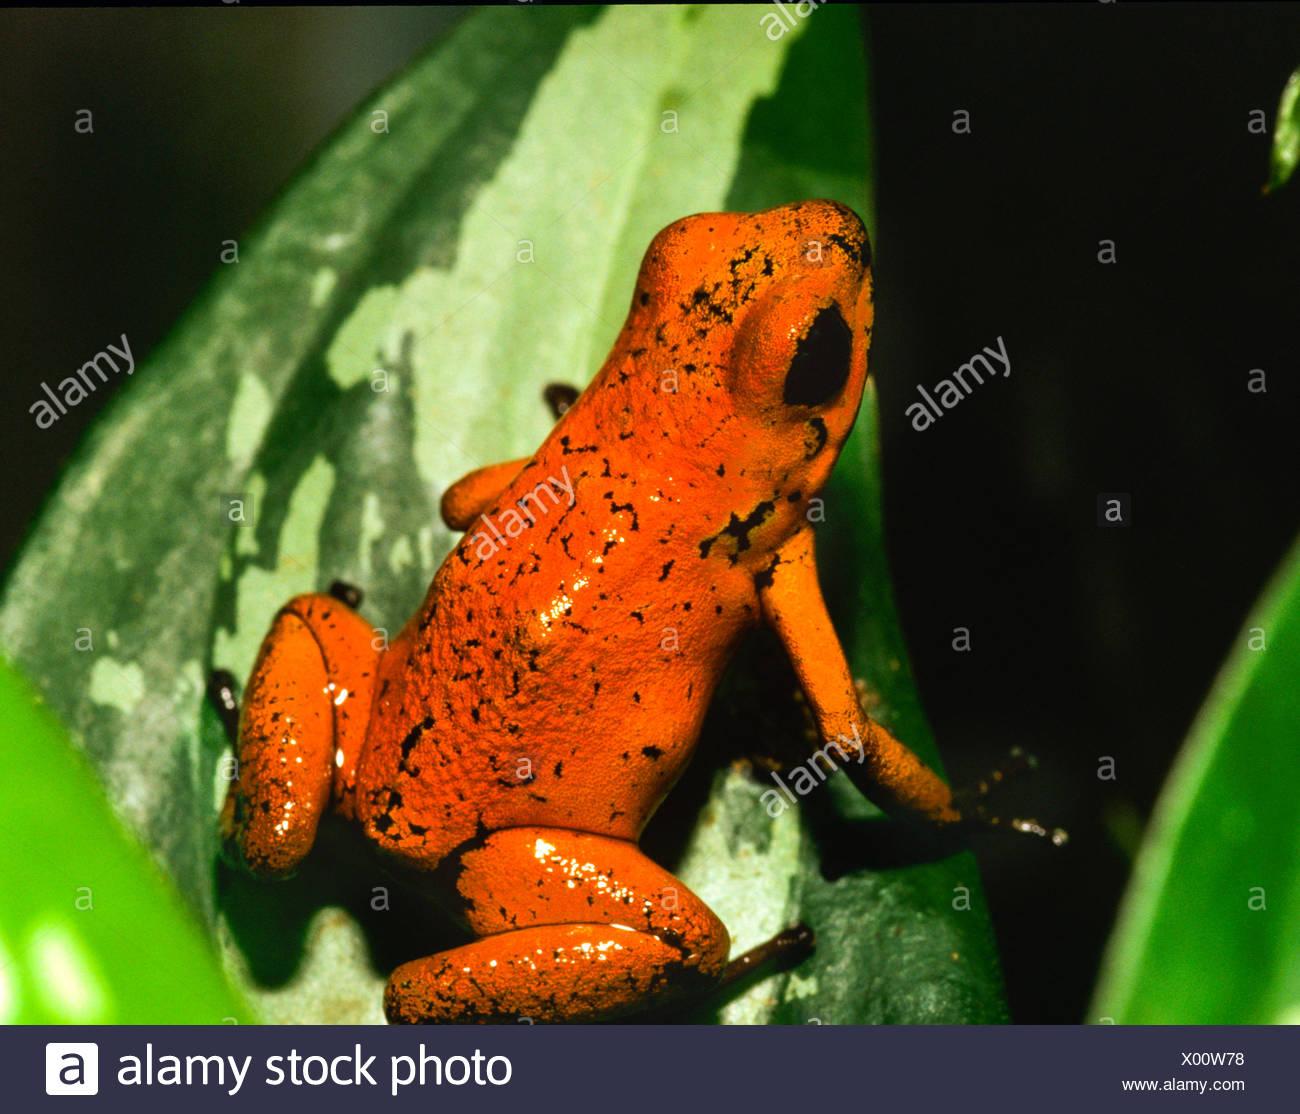 Arrow-poison Frog, (Dendrobates pumilio), Costa Rica - Stock Image